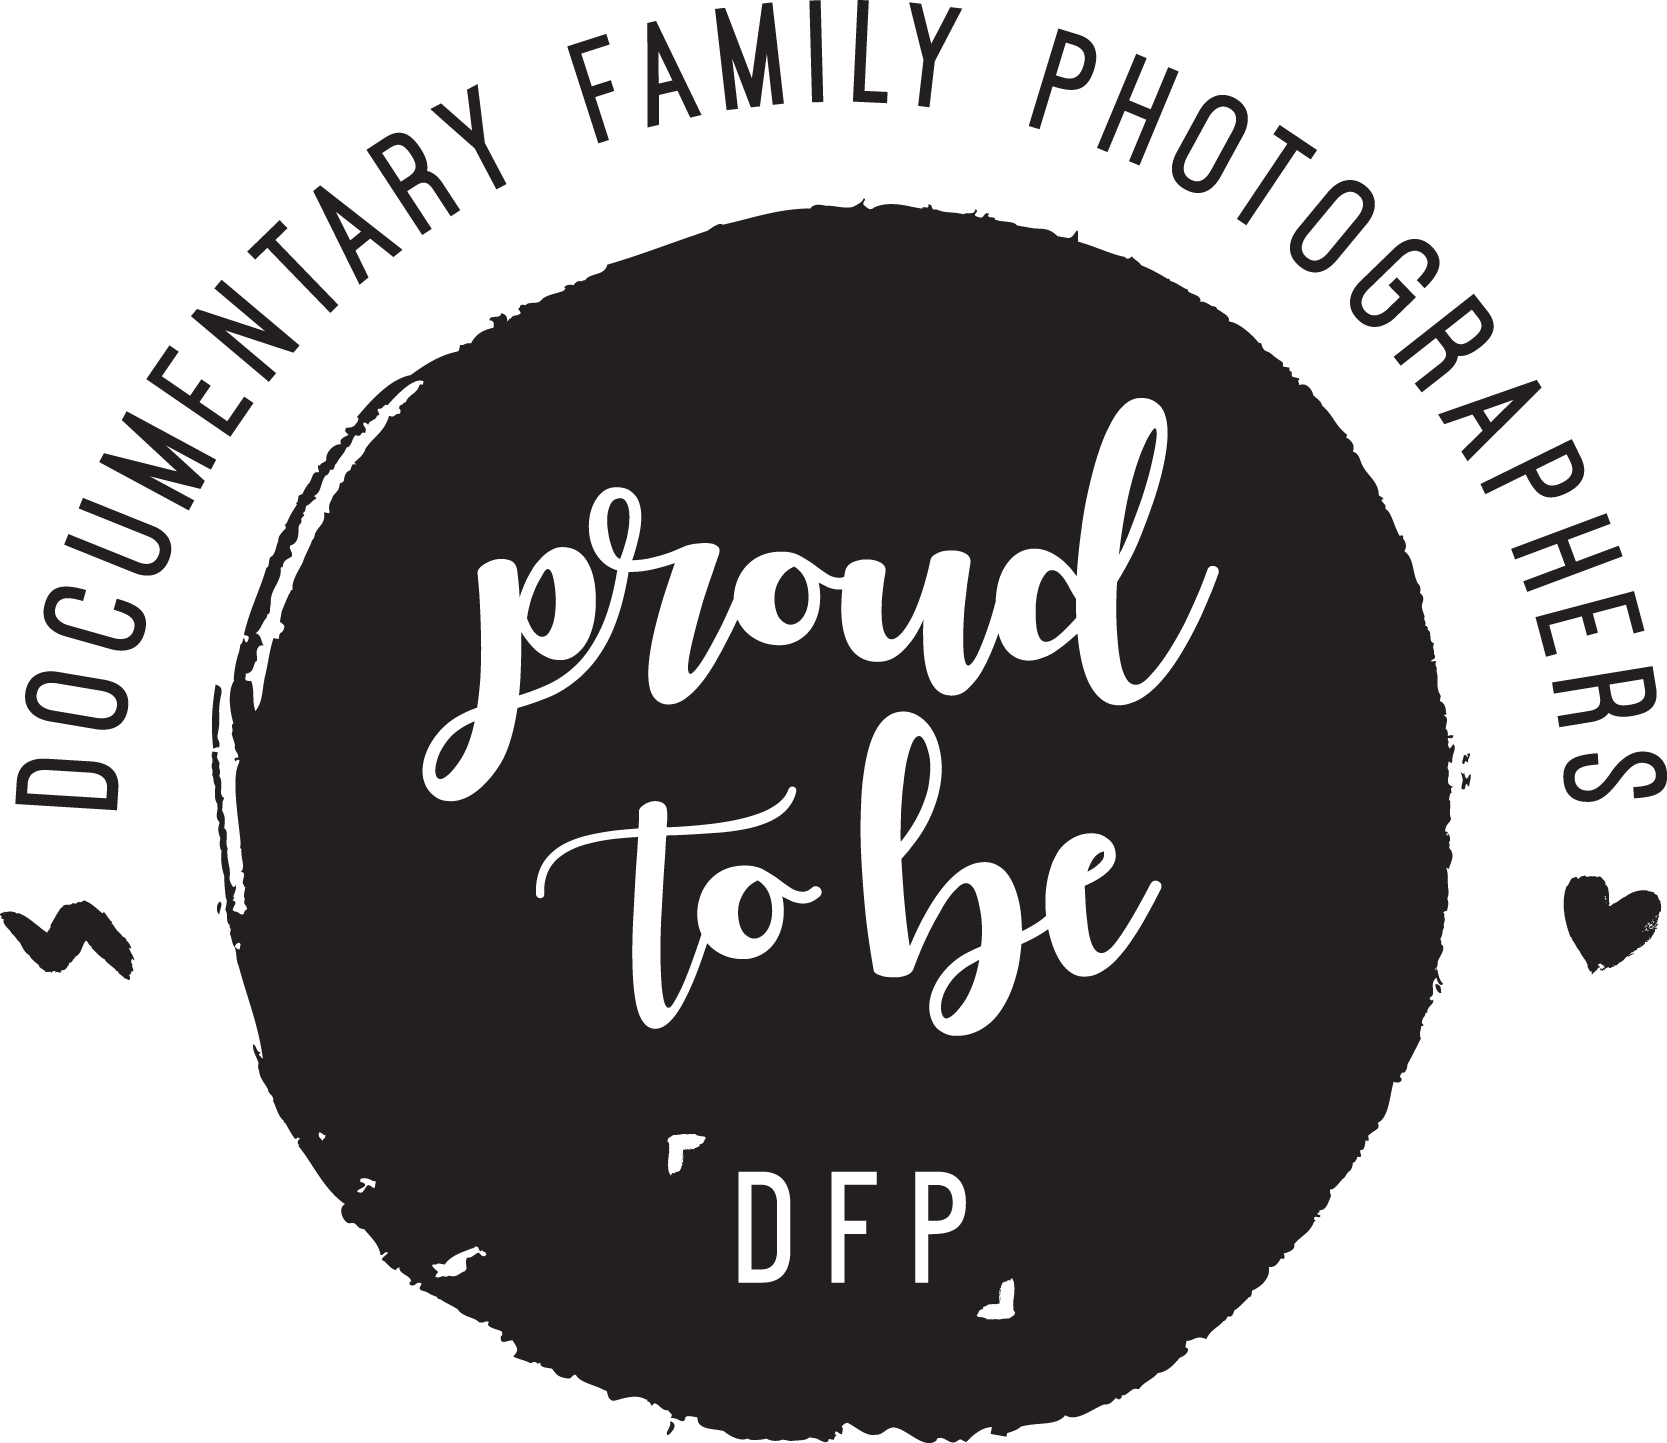 03-DFP-Badge-Black-ProudToBe.png